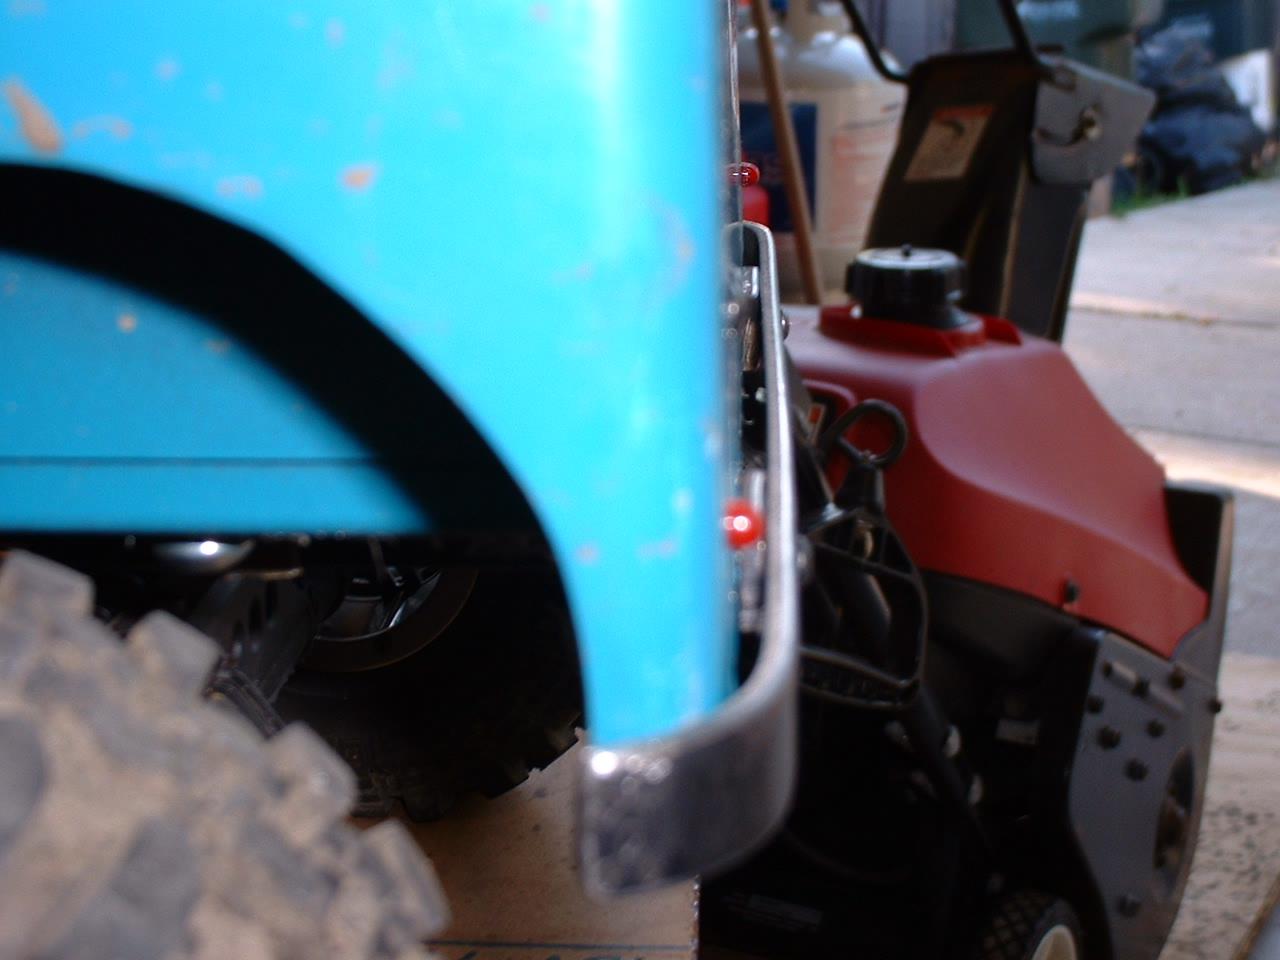 Click image for larger version  Name:G.I. Joe Jeep 7c 007.JPG Views:898 Size:321.3 KB ID:2096626